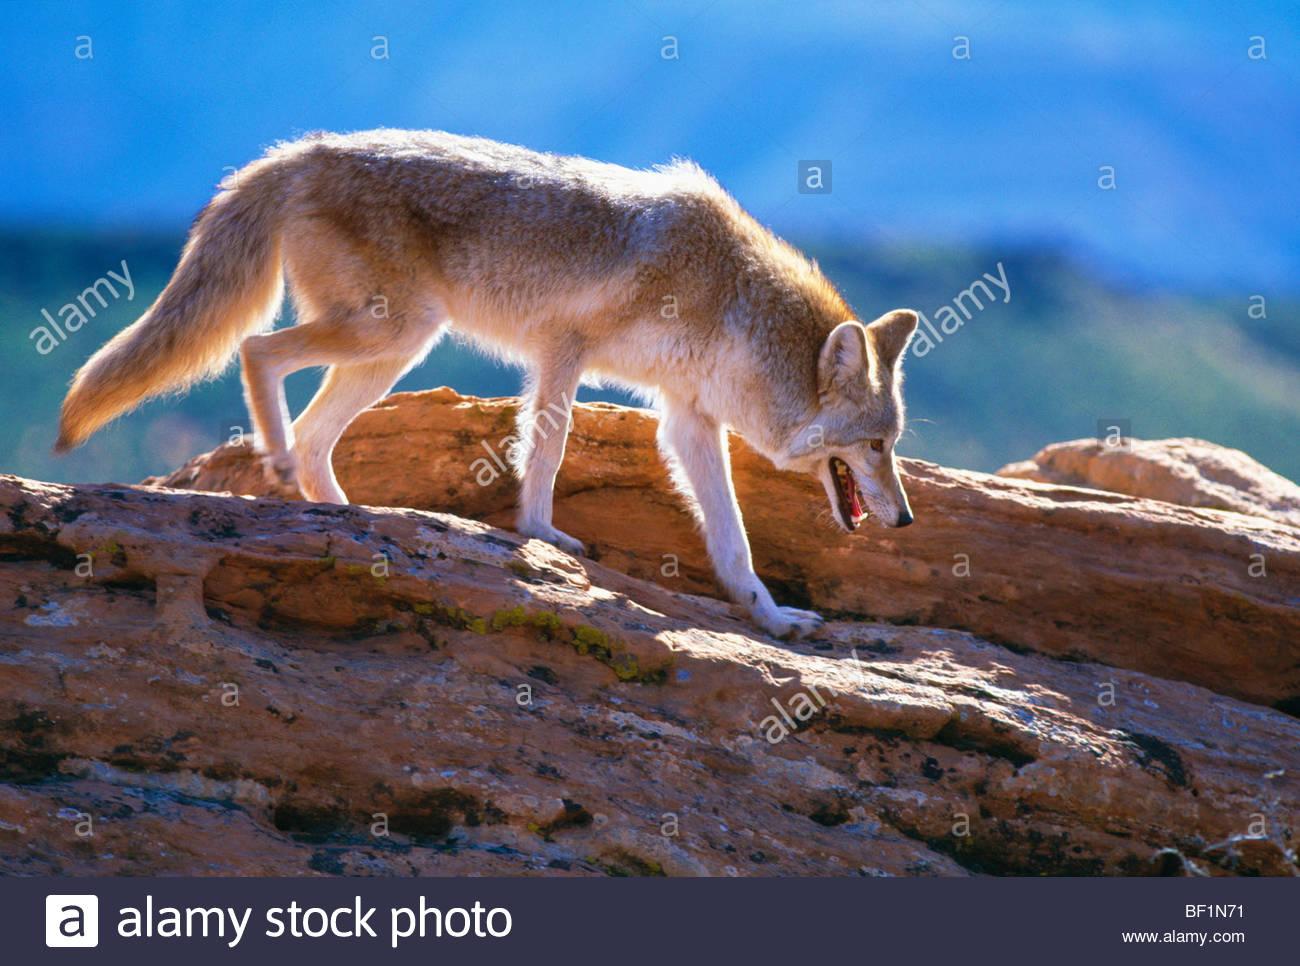 Kojote auf felsen canis latrans zion national park in for Wildparks in der nahe